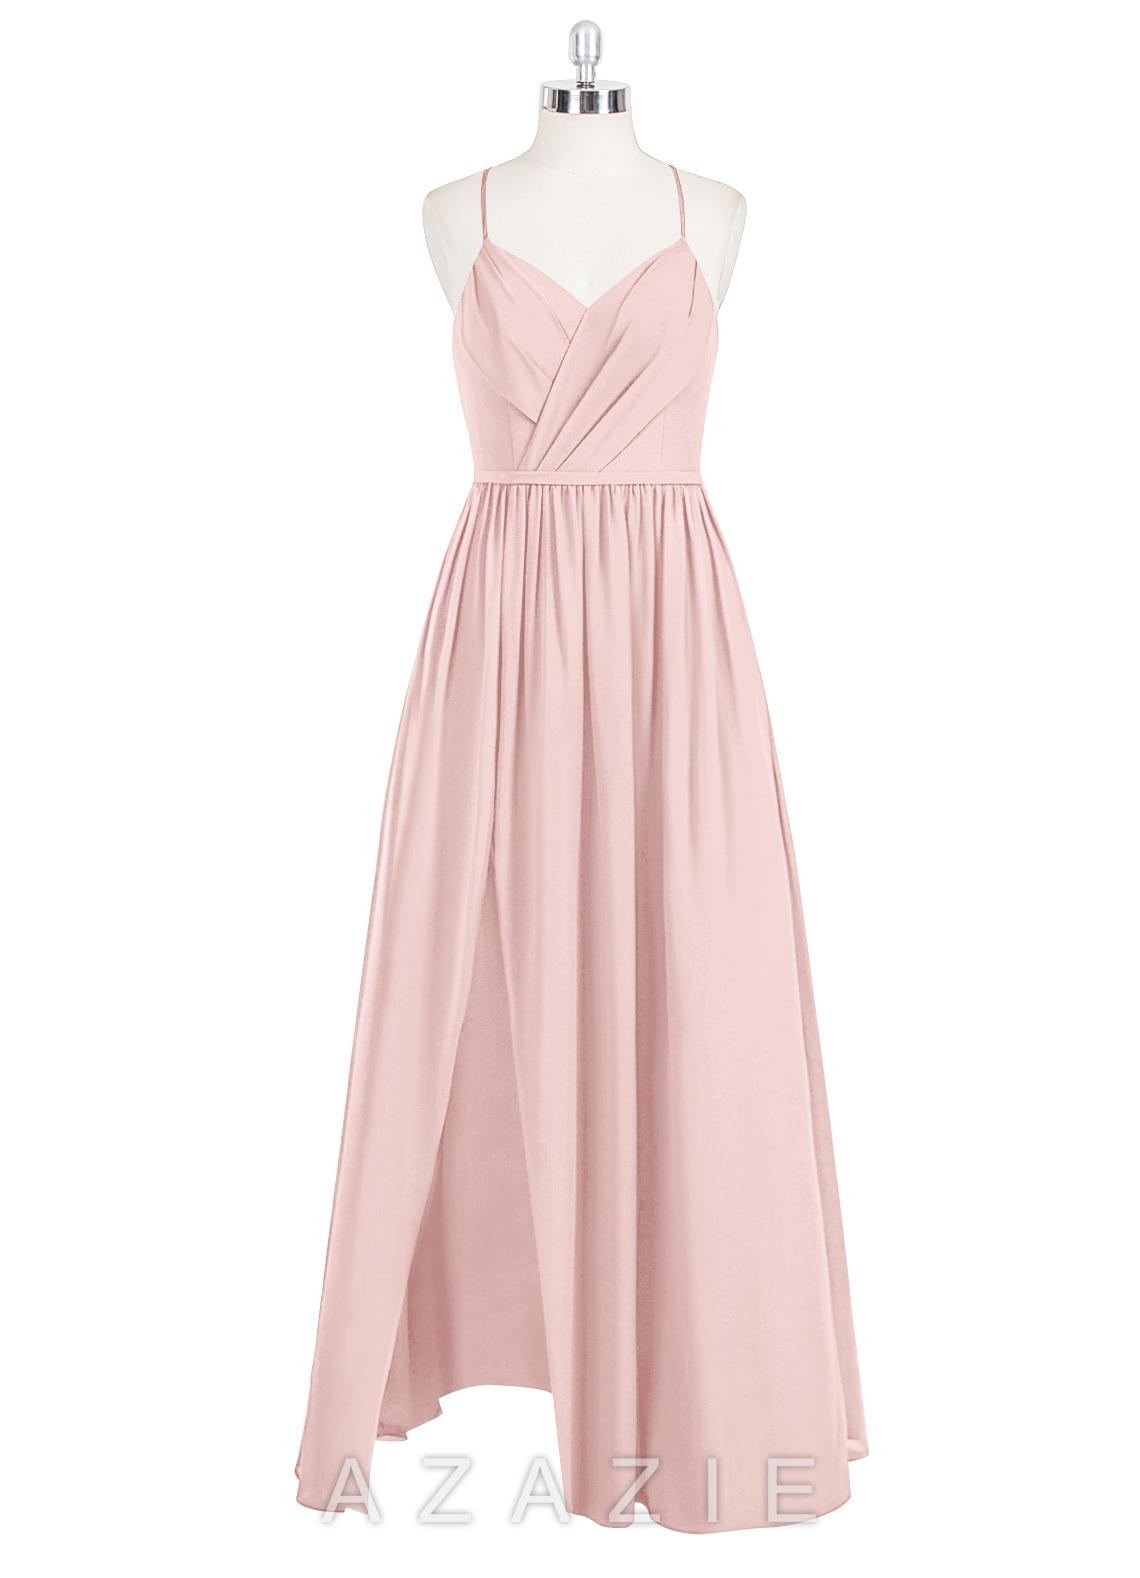 Azazie Cora Bridesmaid Dress | Azazie - photo #26